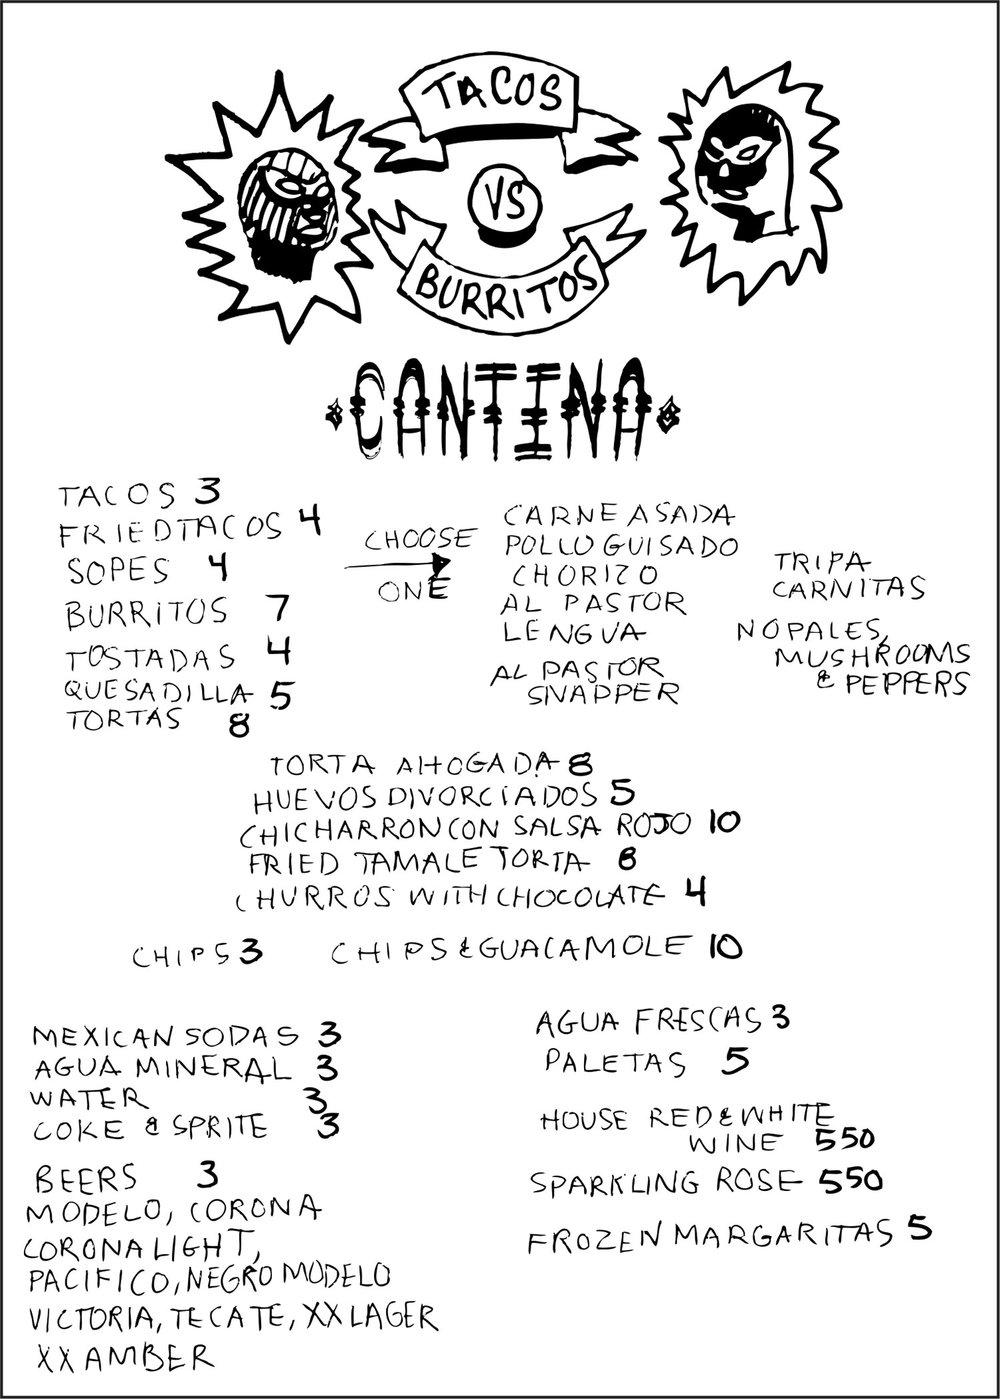 menu new.jpg